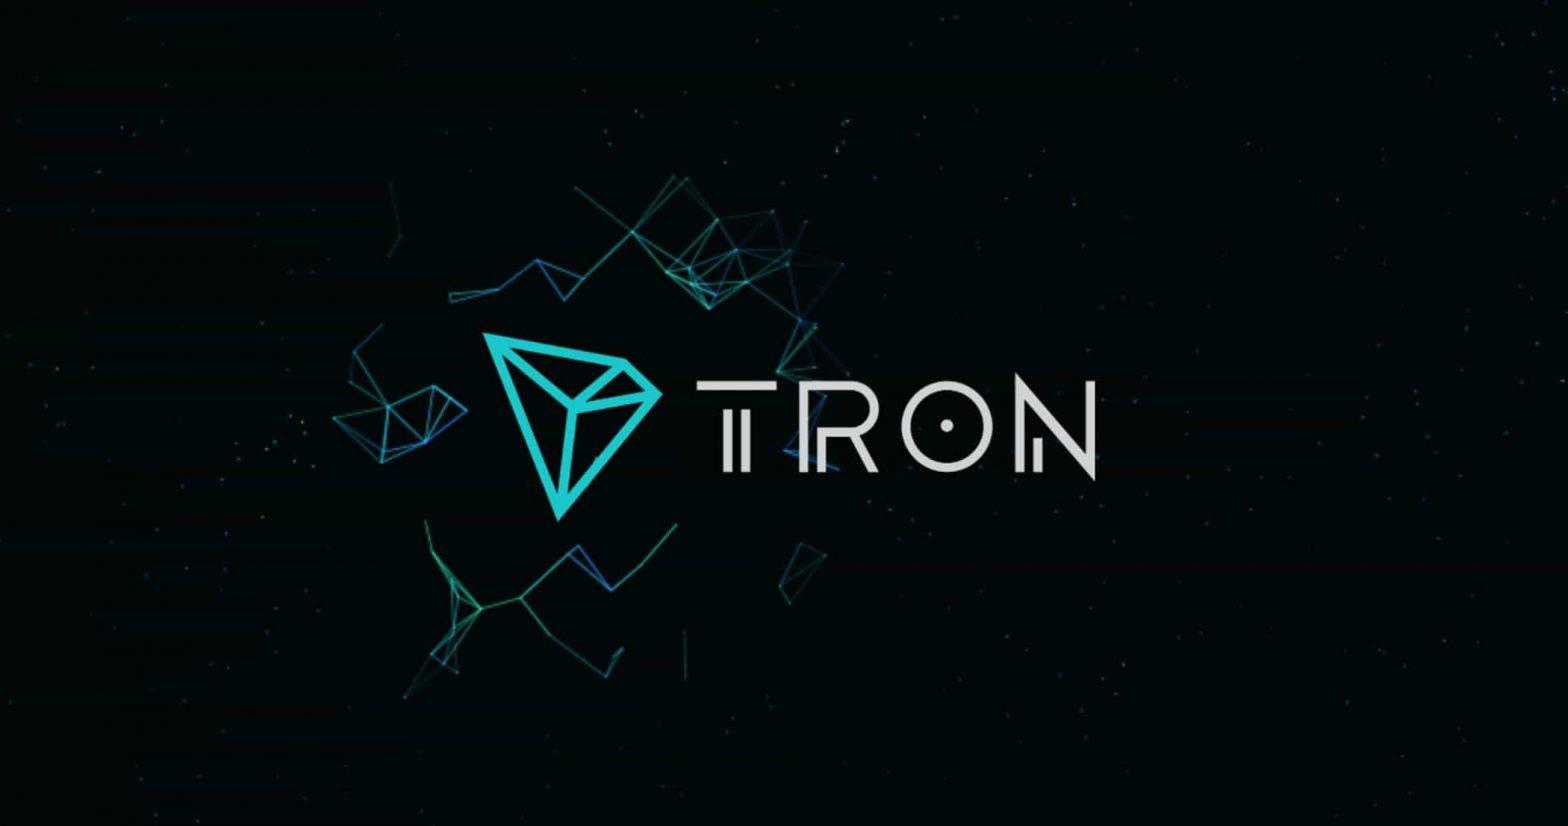 Tron (TRX) Price Analysis